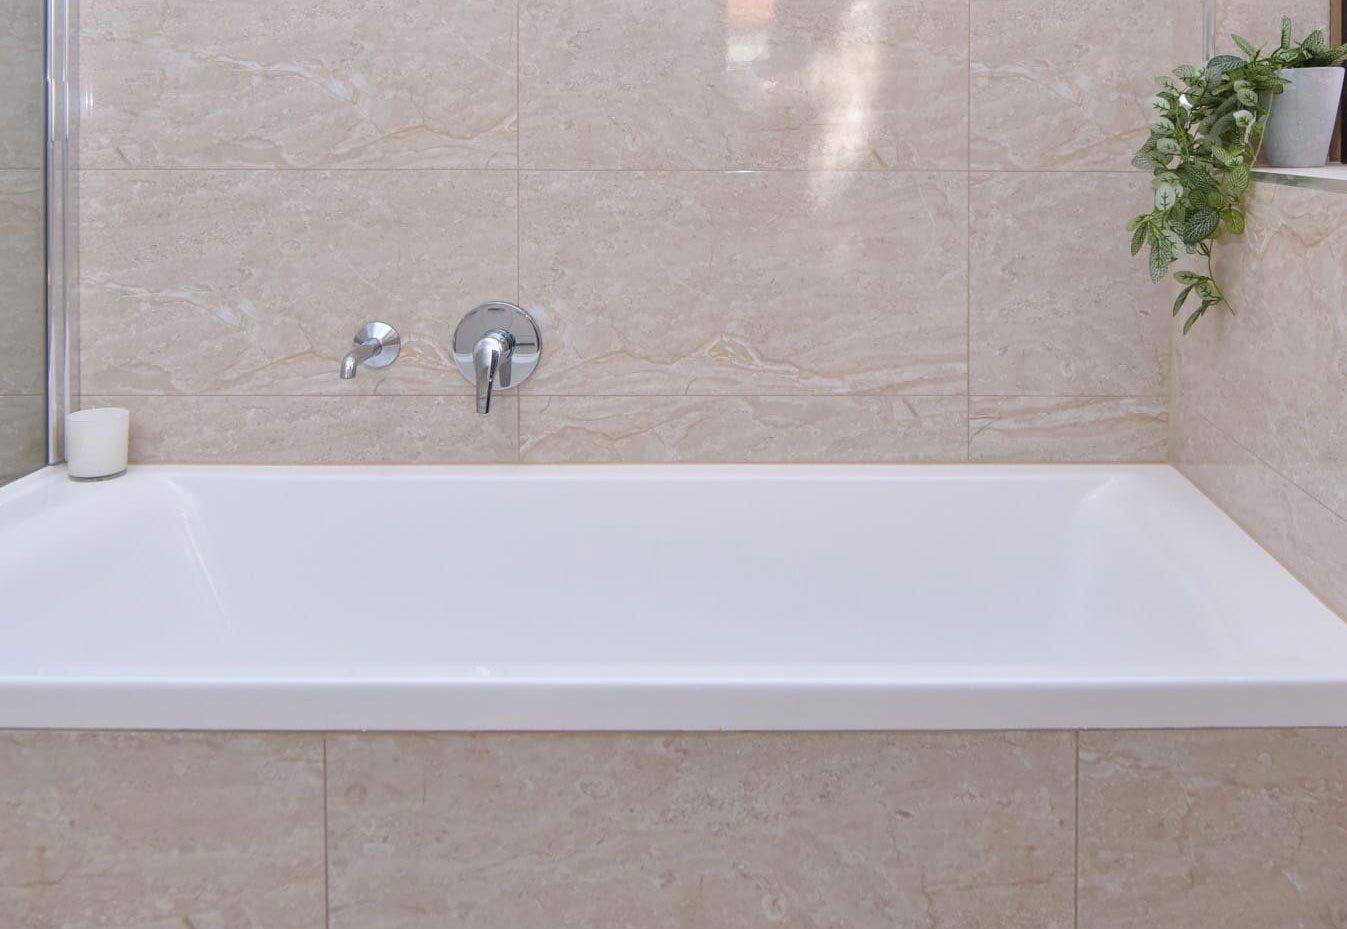 Bathrooms-40.jpg#asset:2403